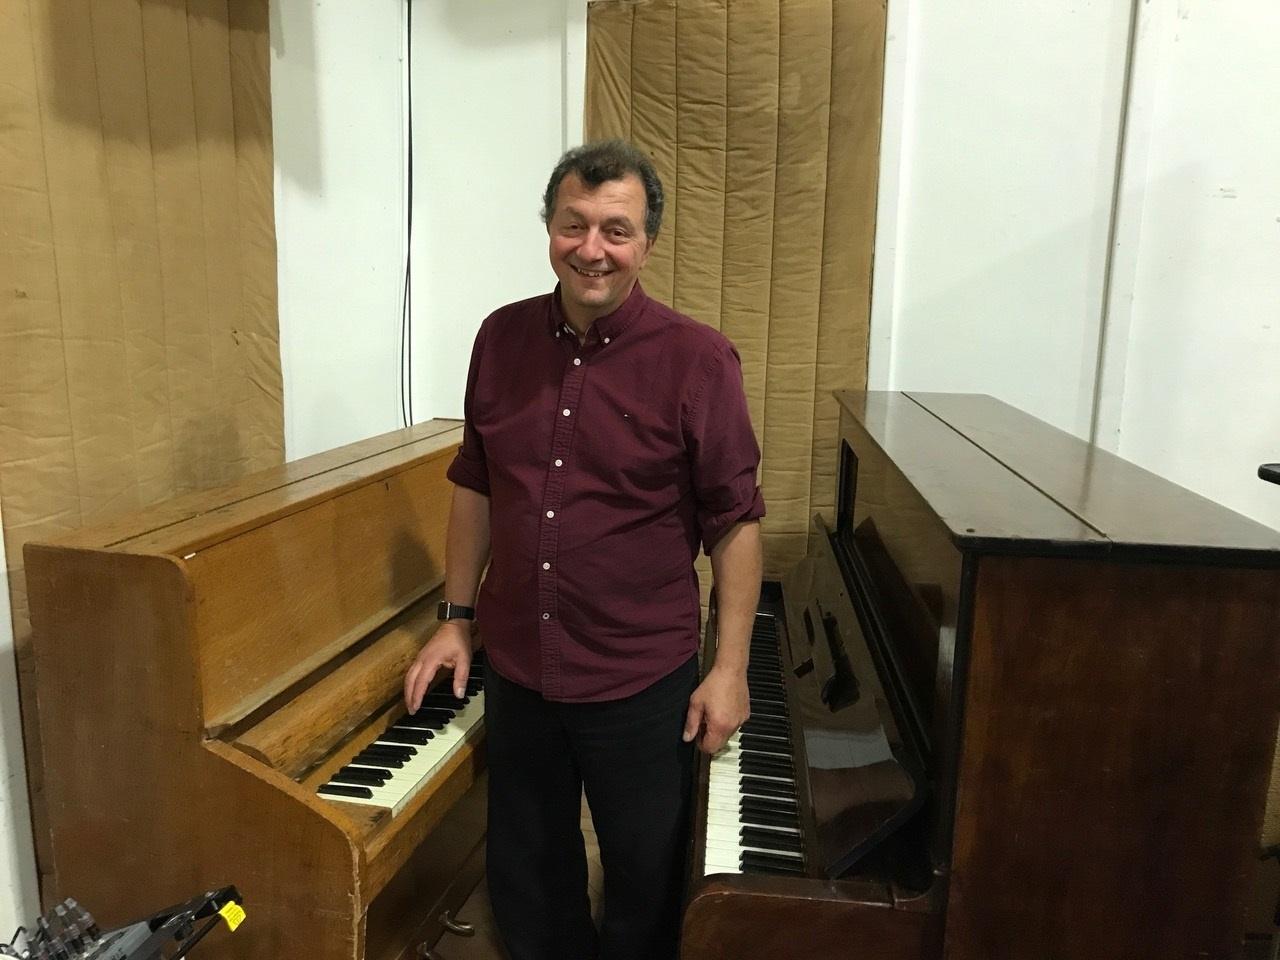 Frank at Abbey Road Studios in London